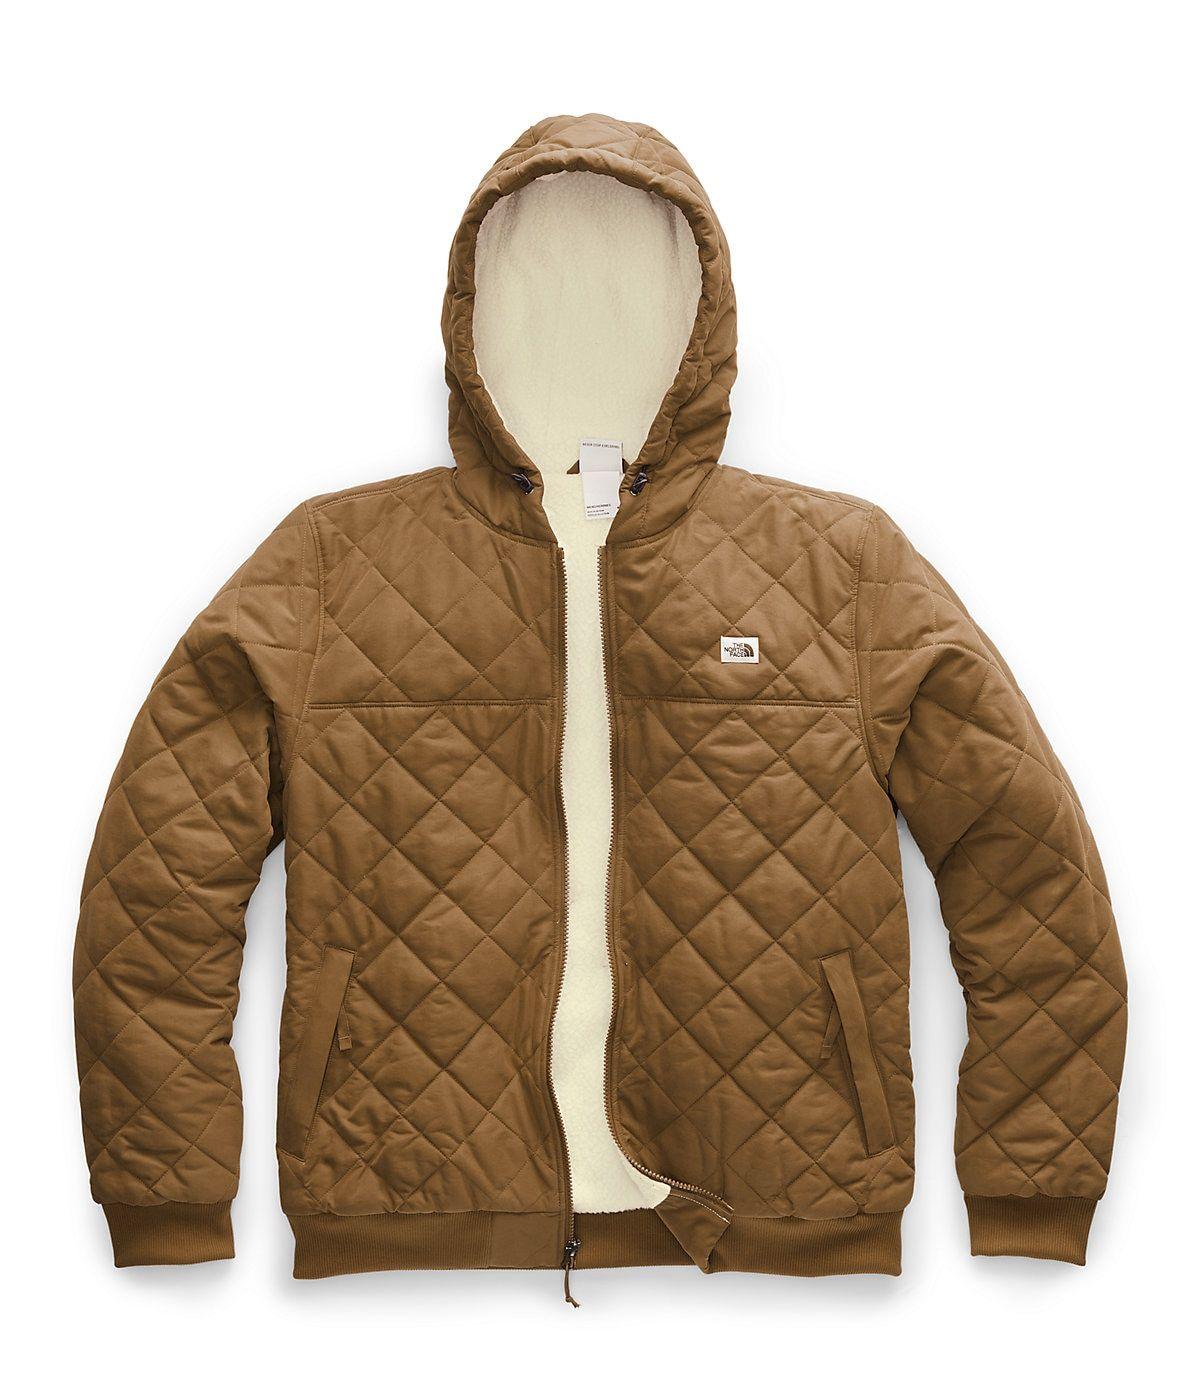 Men S Cuchillo Insulated Full Zip Hoodie 2 0 The North Face Hooded Jacket Men North Face Jacket Womens North Face Mens [ 1396 x 1200 Pixel ]